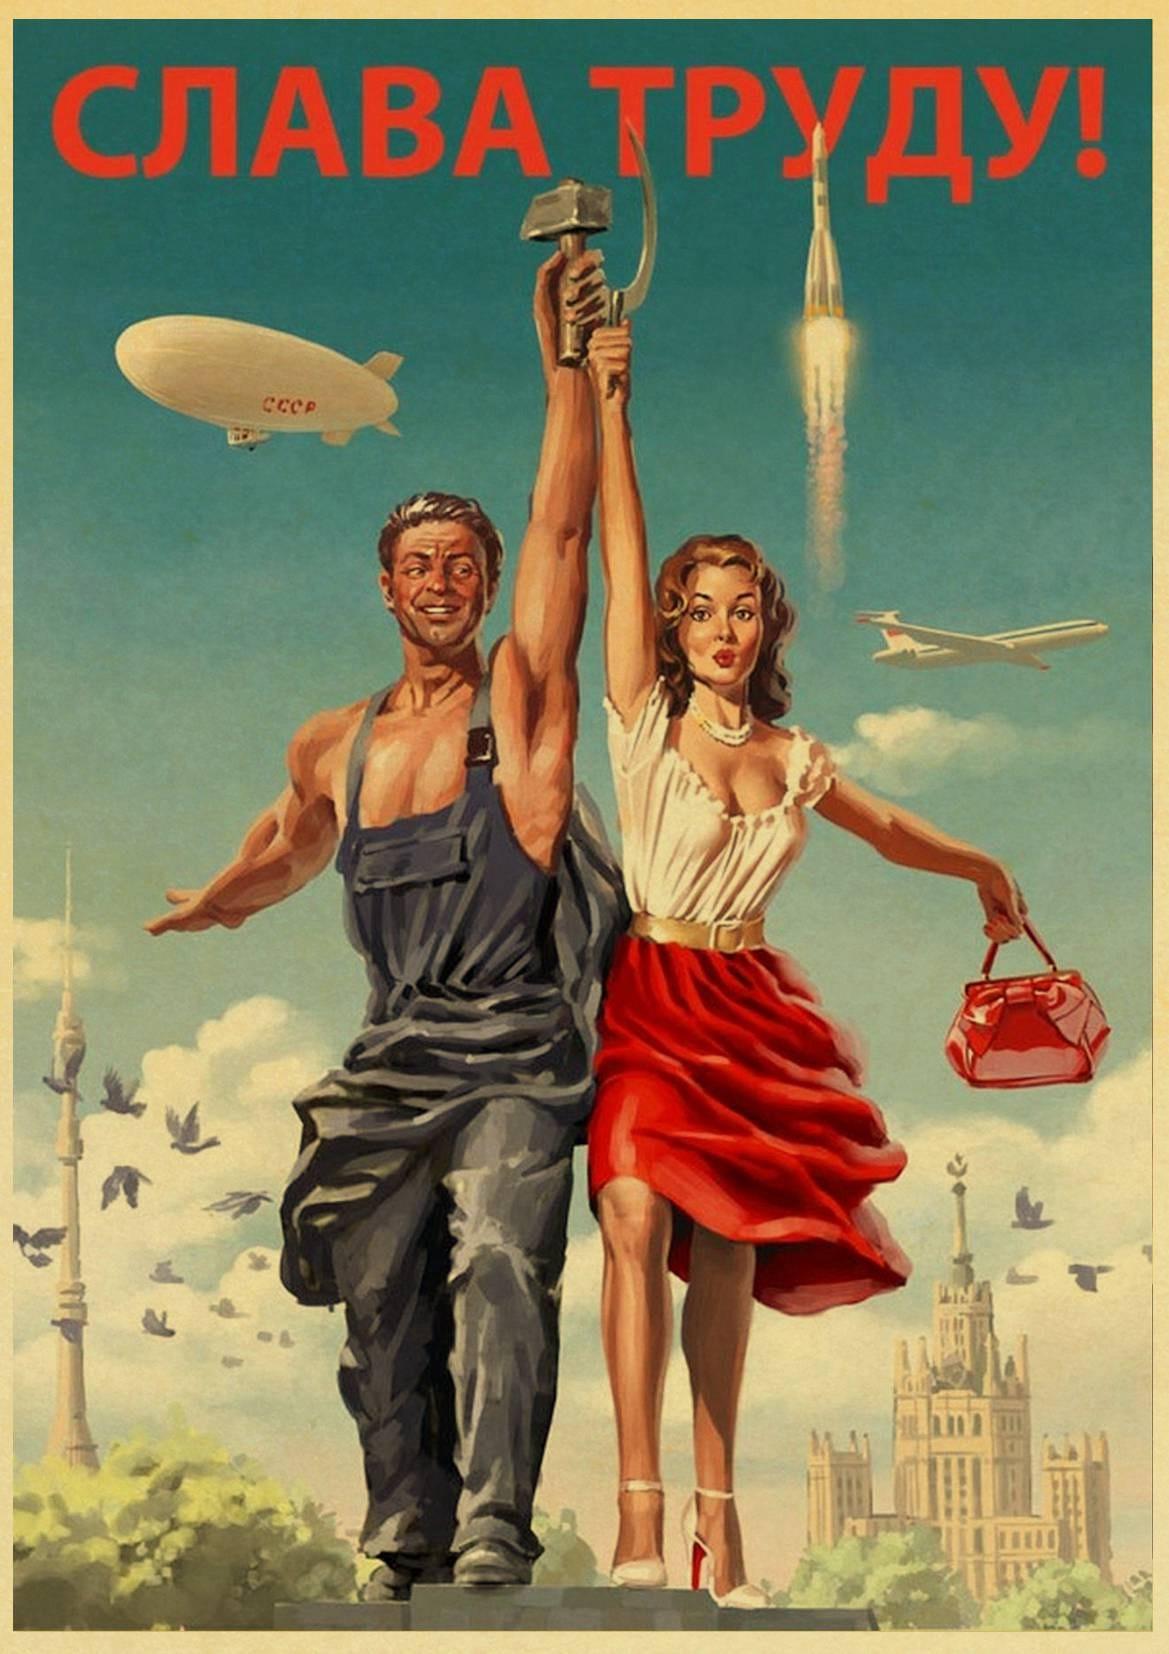 HTB1H6nqX6DuK1Rjy1zjq6zraFXaM Stalin USSR CCCP Retro Poster Good Quality Printed Wall Retro Posters For Home Bar Cafe Room Wall sticker